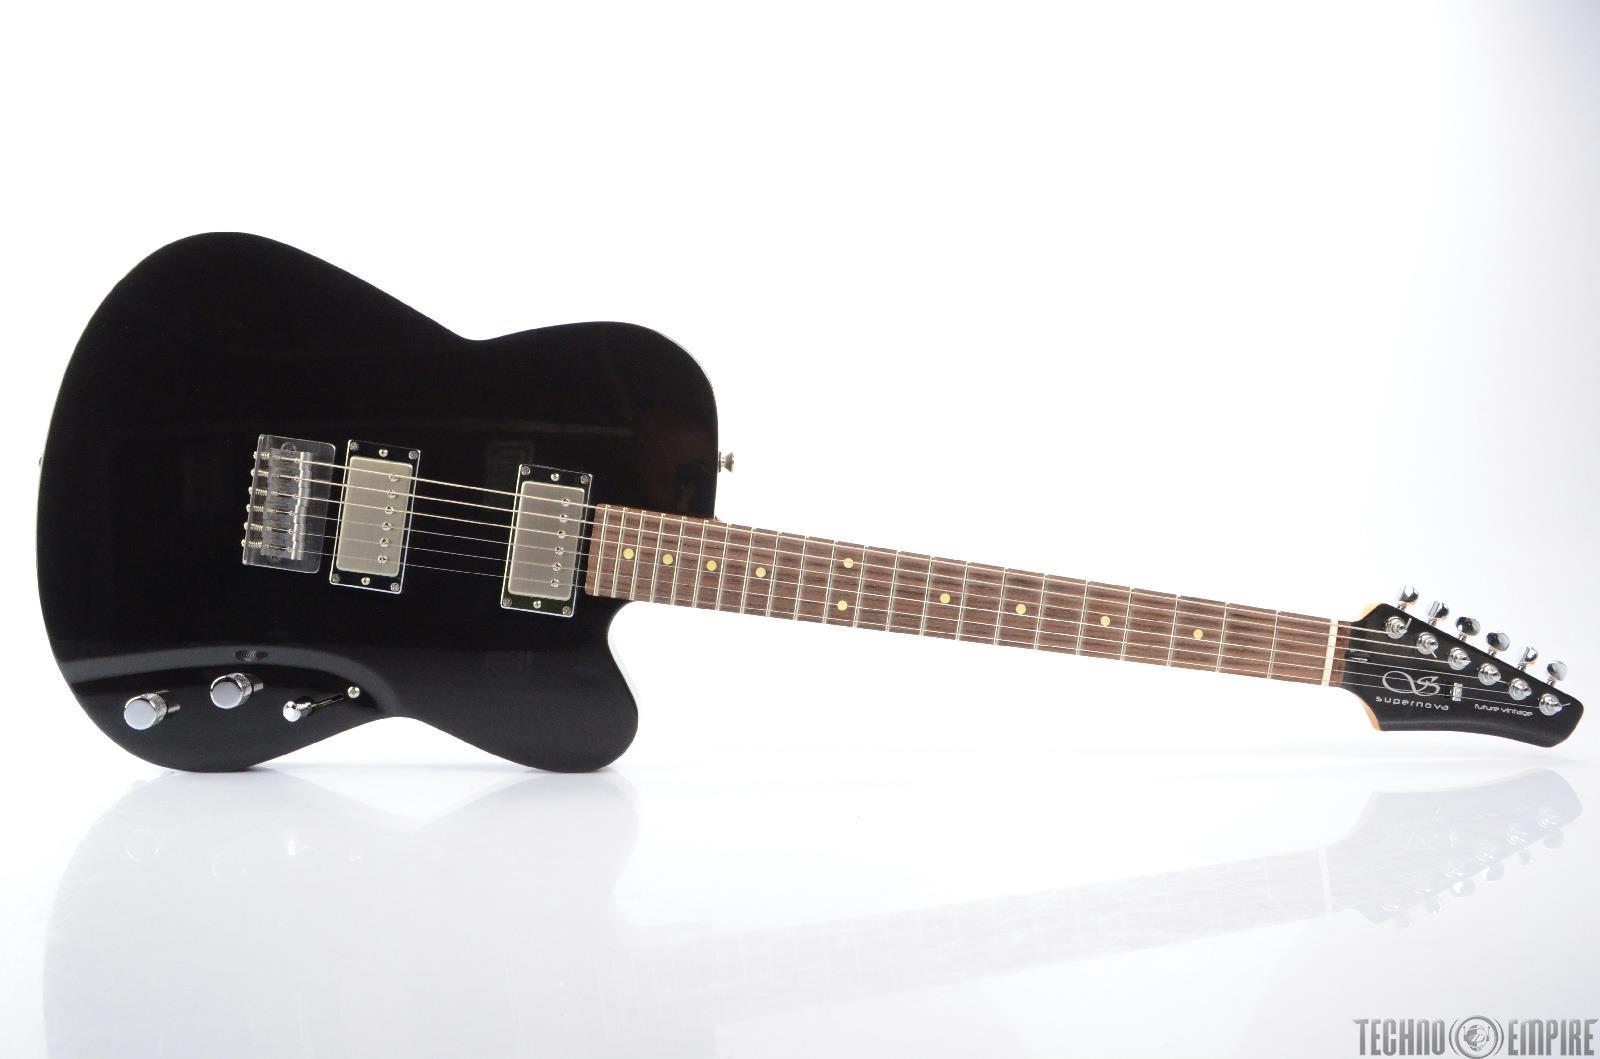 buzz feiten supernova futura prototype black electric guitar w gig bag 23277 ebay. Black Bedroom Furniture Sets. Home Design Ideas